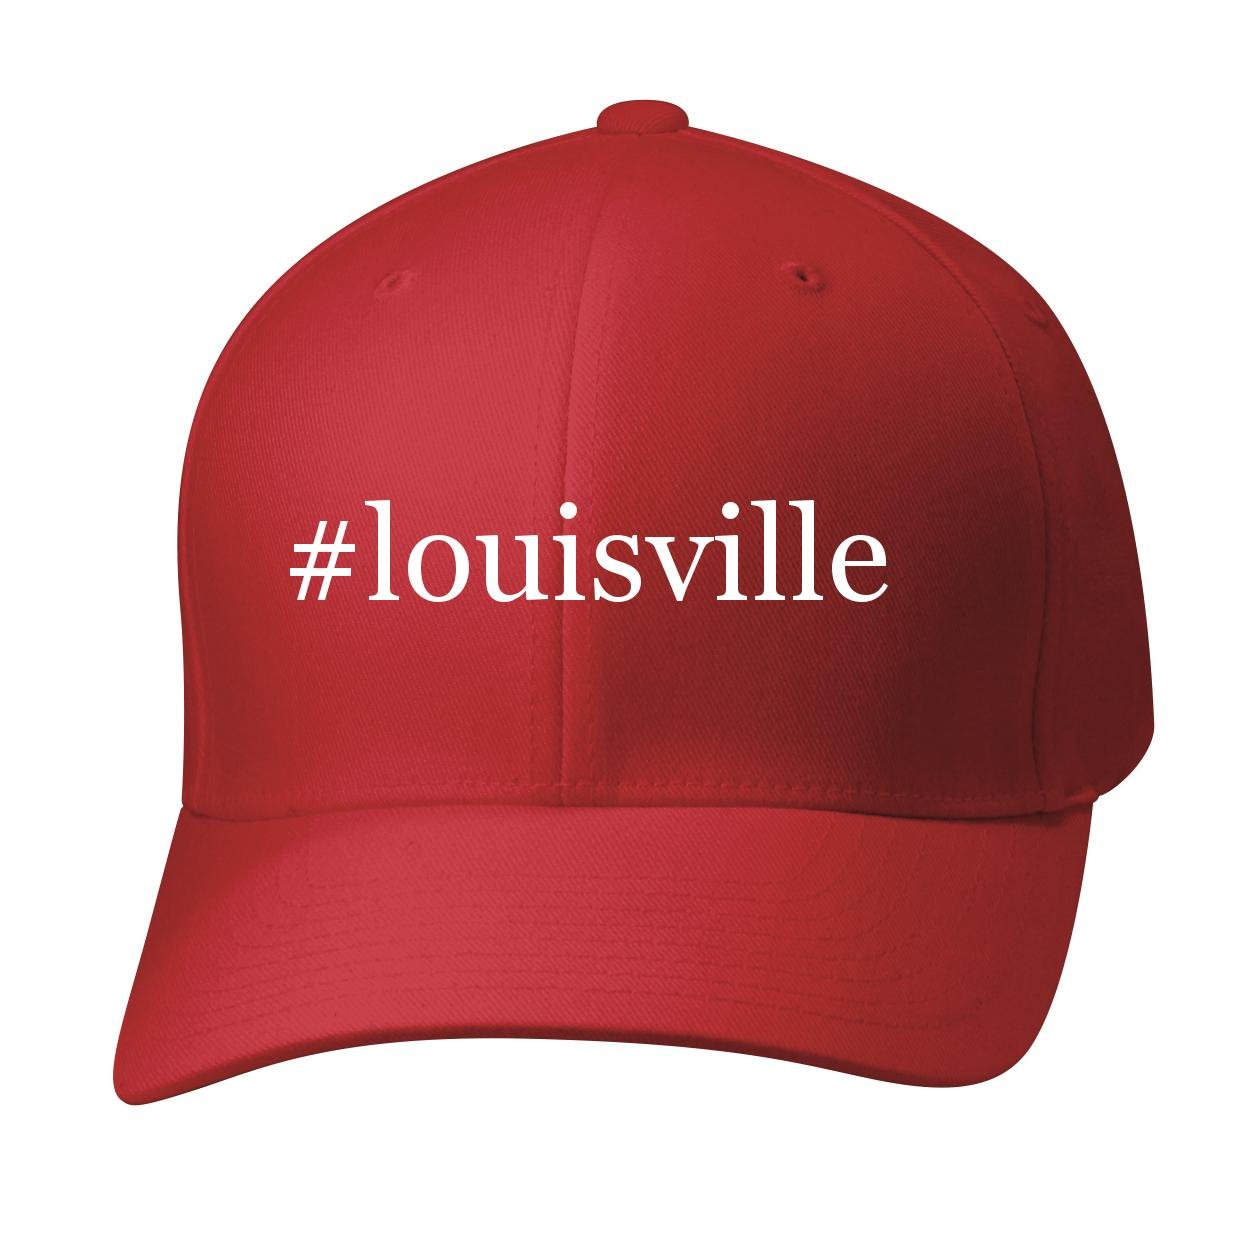 ca265ab298579 Amazon.com   Louisville - Baseball Hat Cap Adult  Clothing